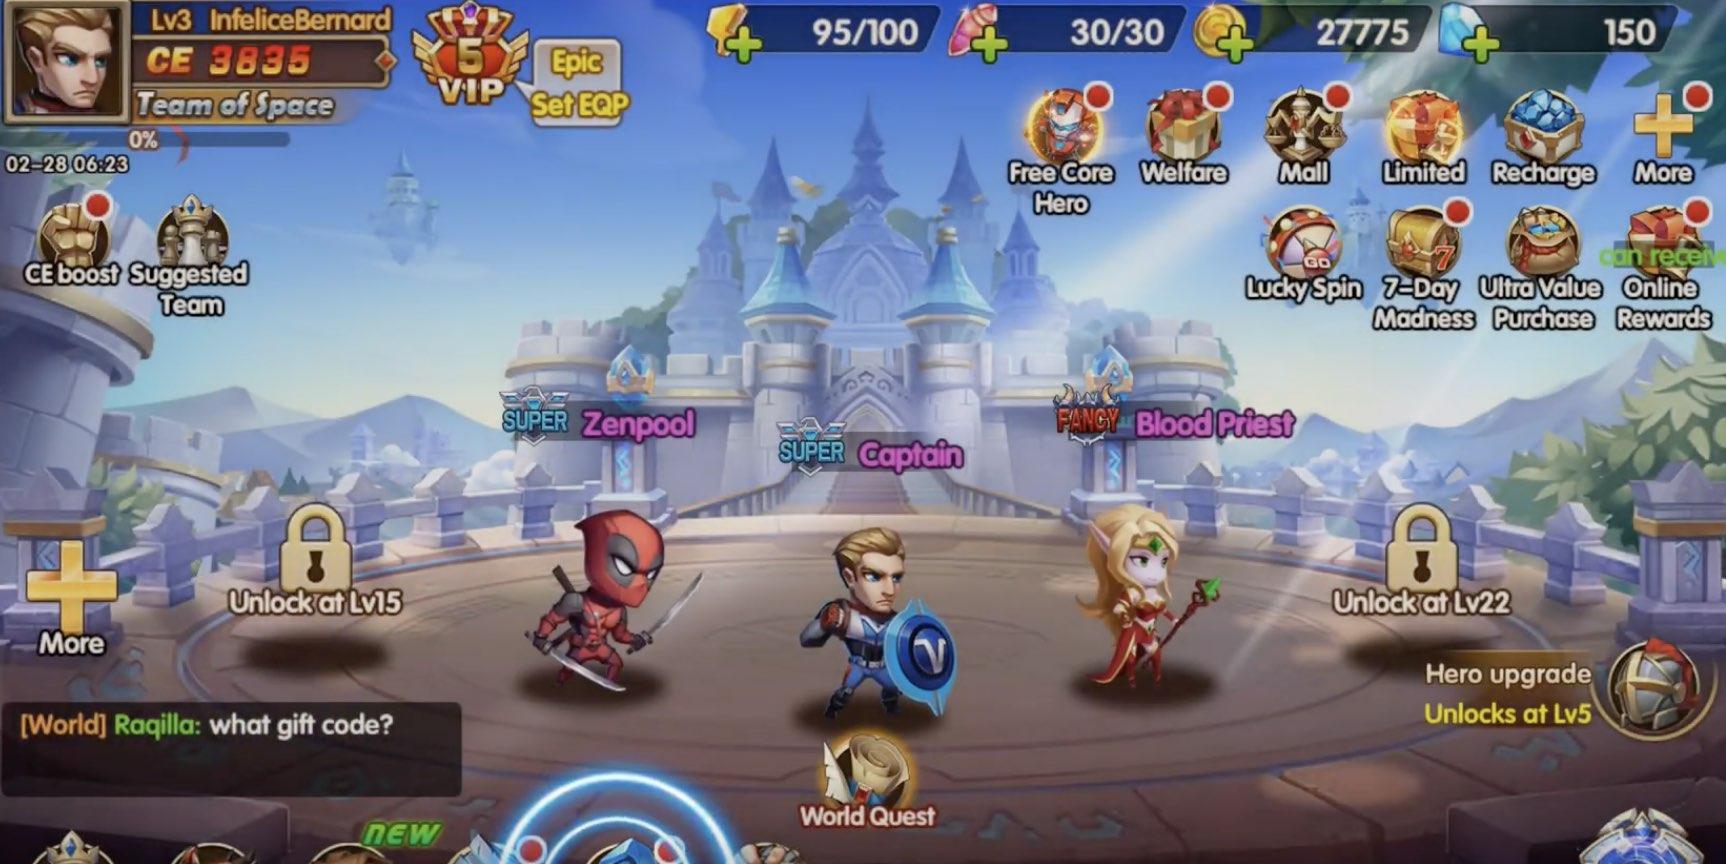 Super Heroes Galaxy tips